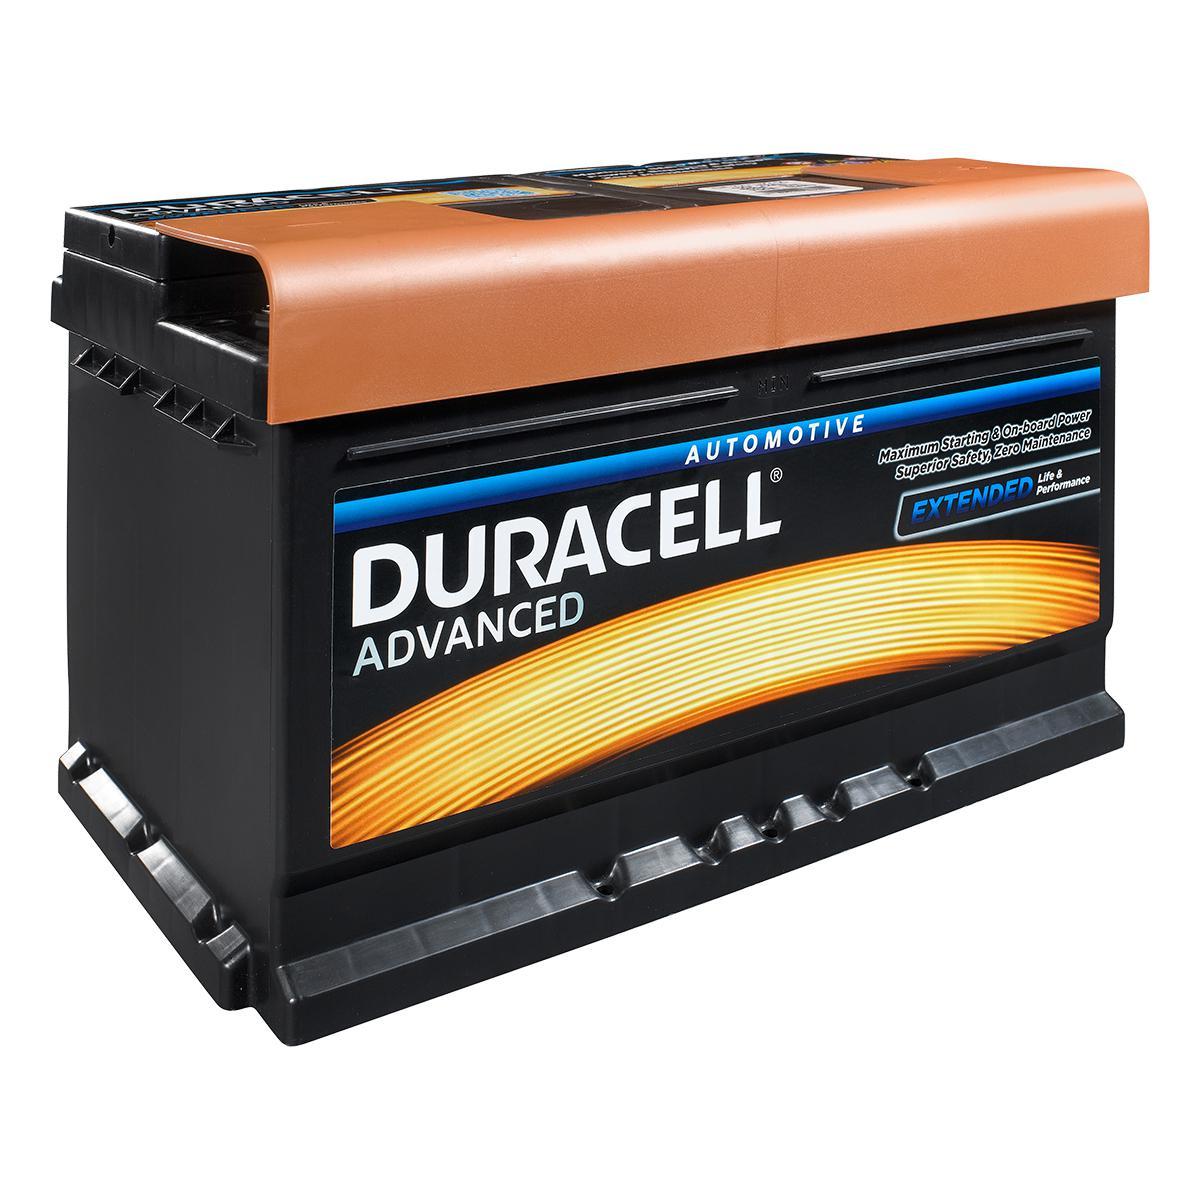 Duracell Advanced